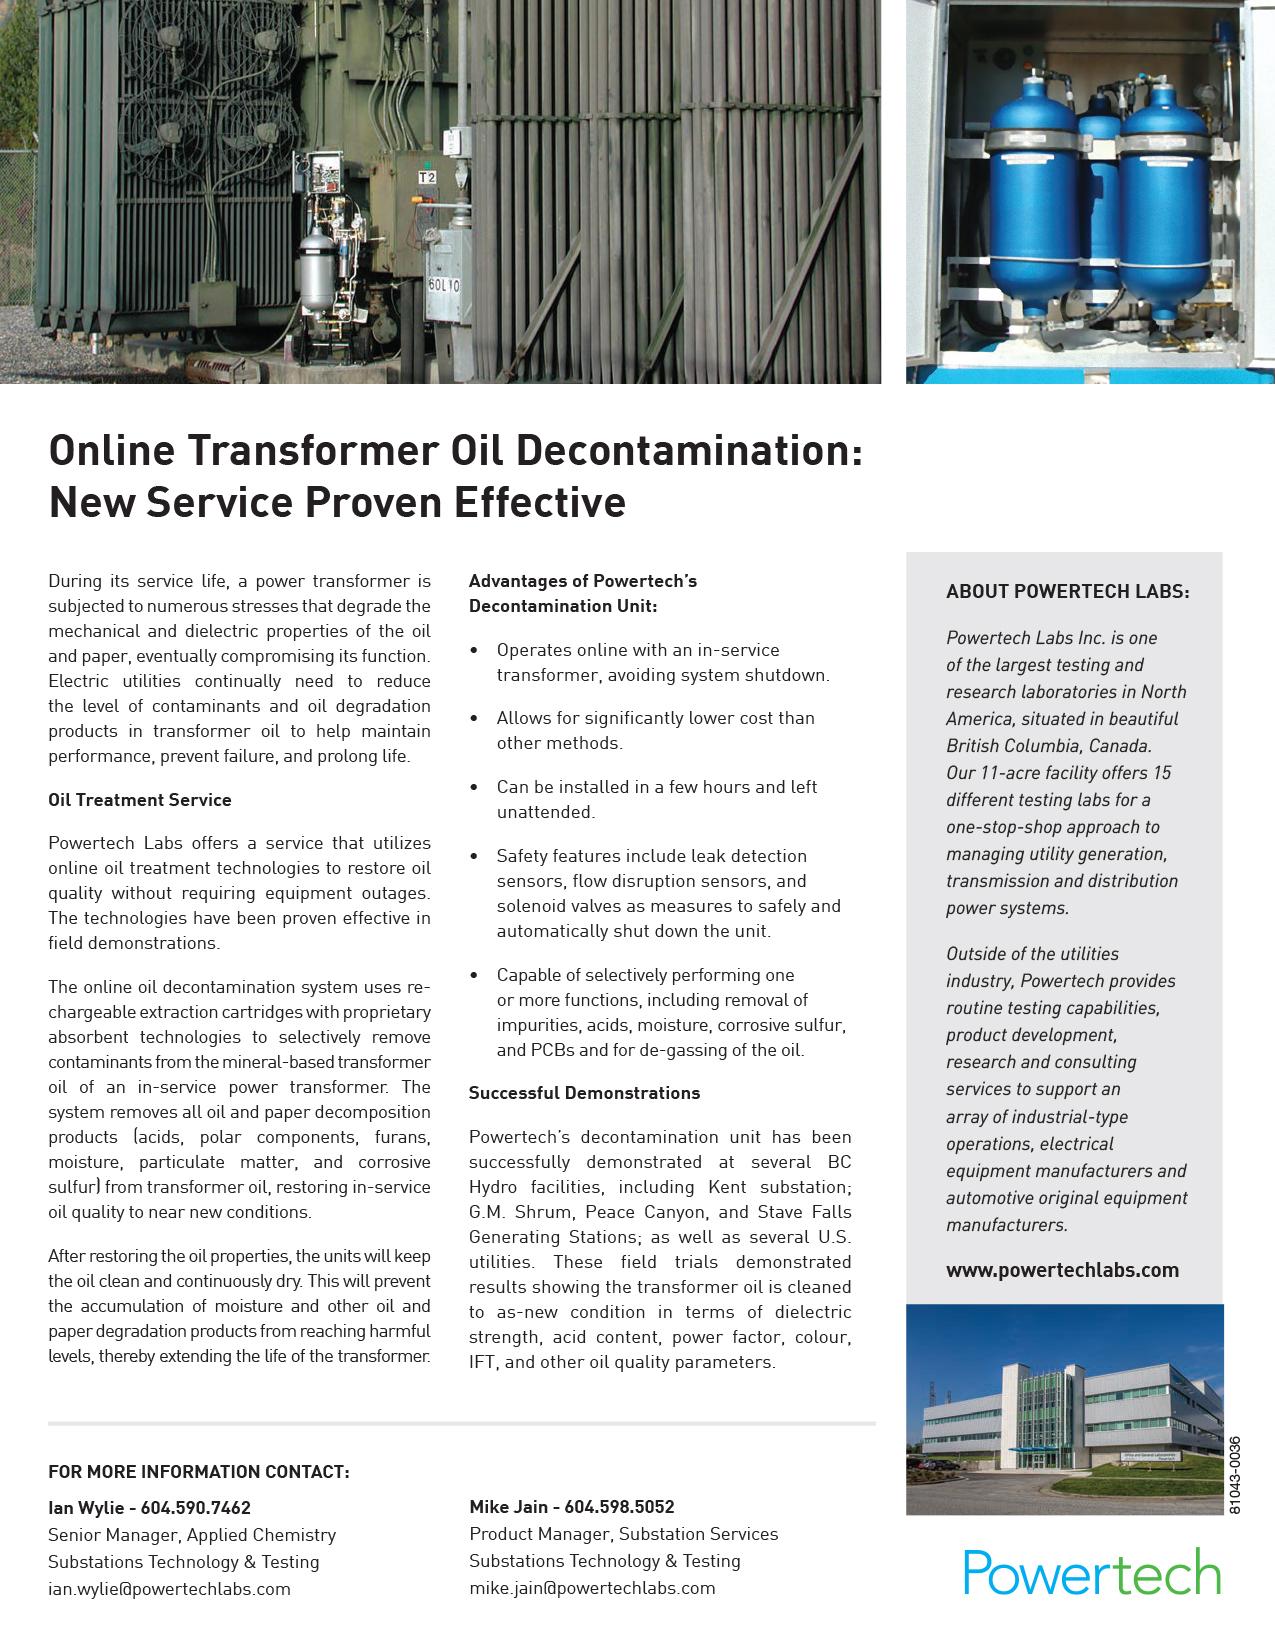 "<a href=""/s/Oil-Decontamination-rev-4.pdf"">Online Oil Decontamination</a>"